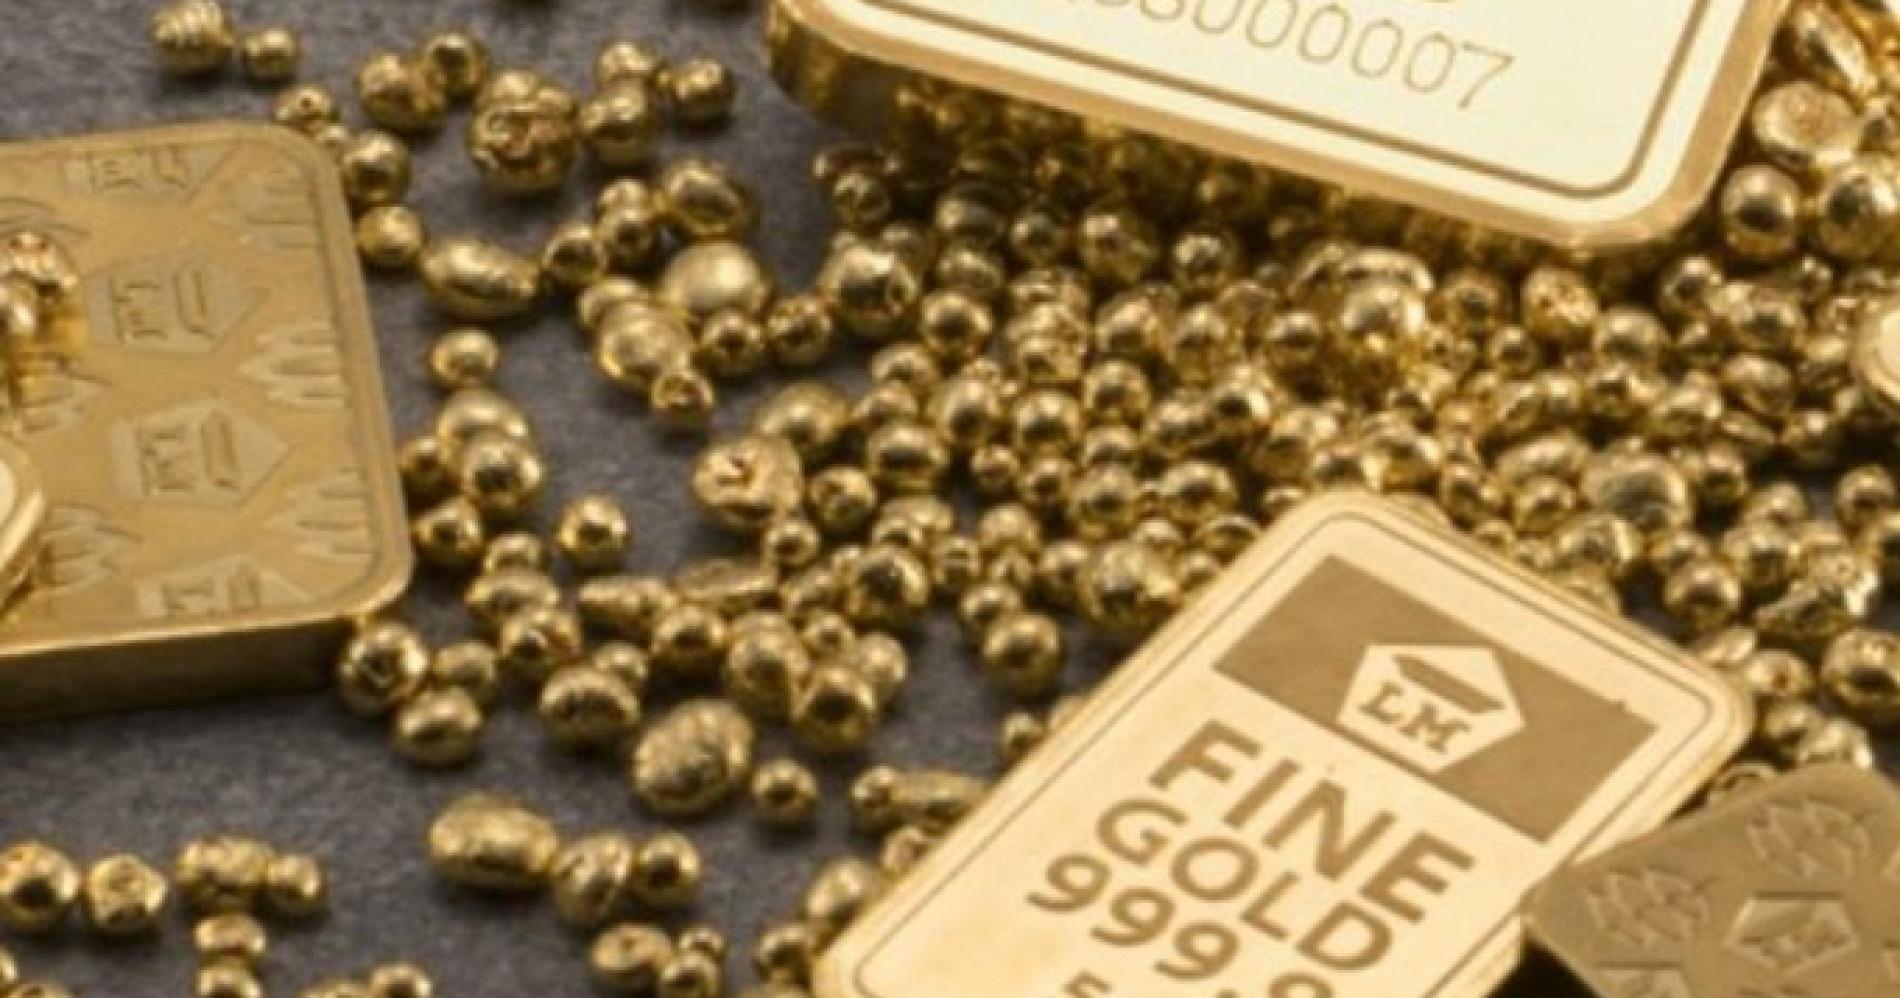 Produksi emas batangan PT Aneka Tambang Tbk. (Sumber gambar: logammulia.com)